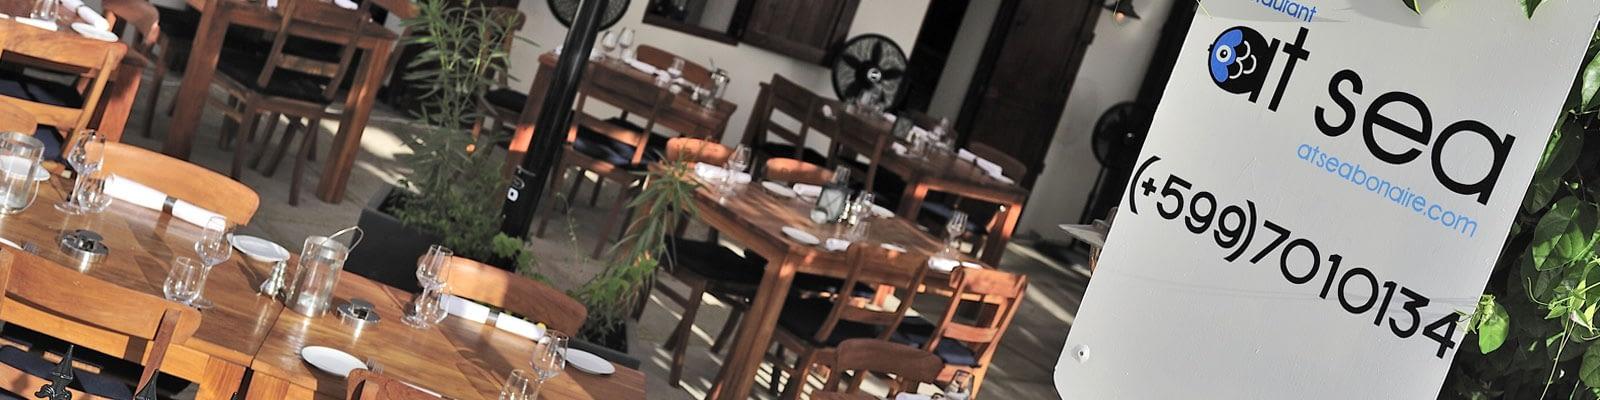 At-Sea-Restaurant-Bonaire-sliderimage-1.jpg